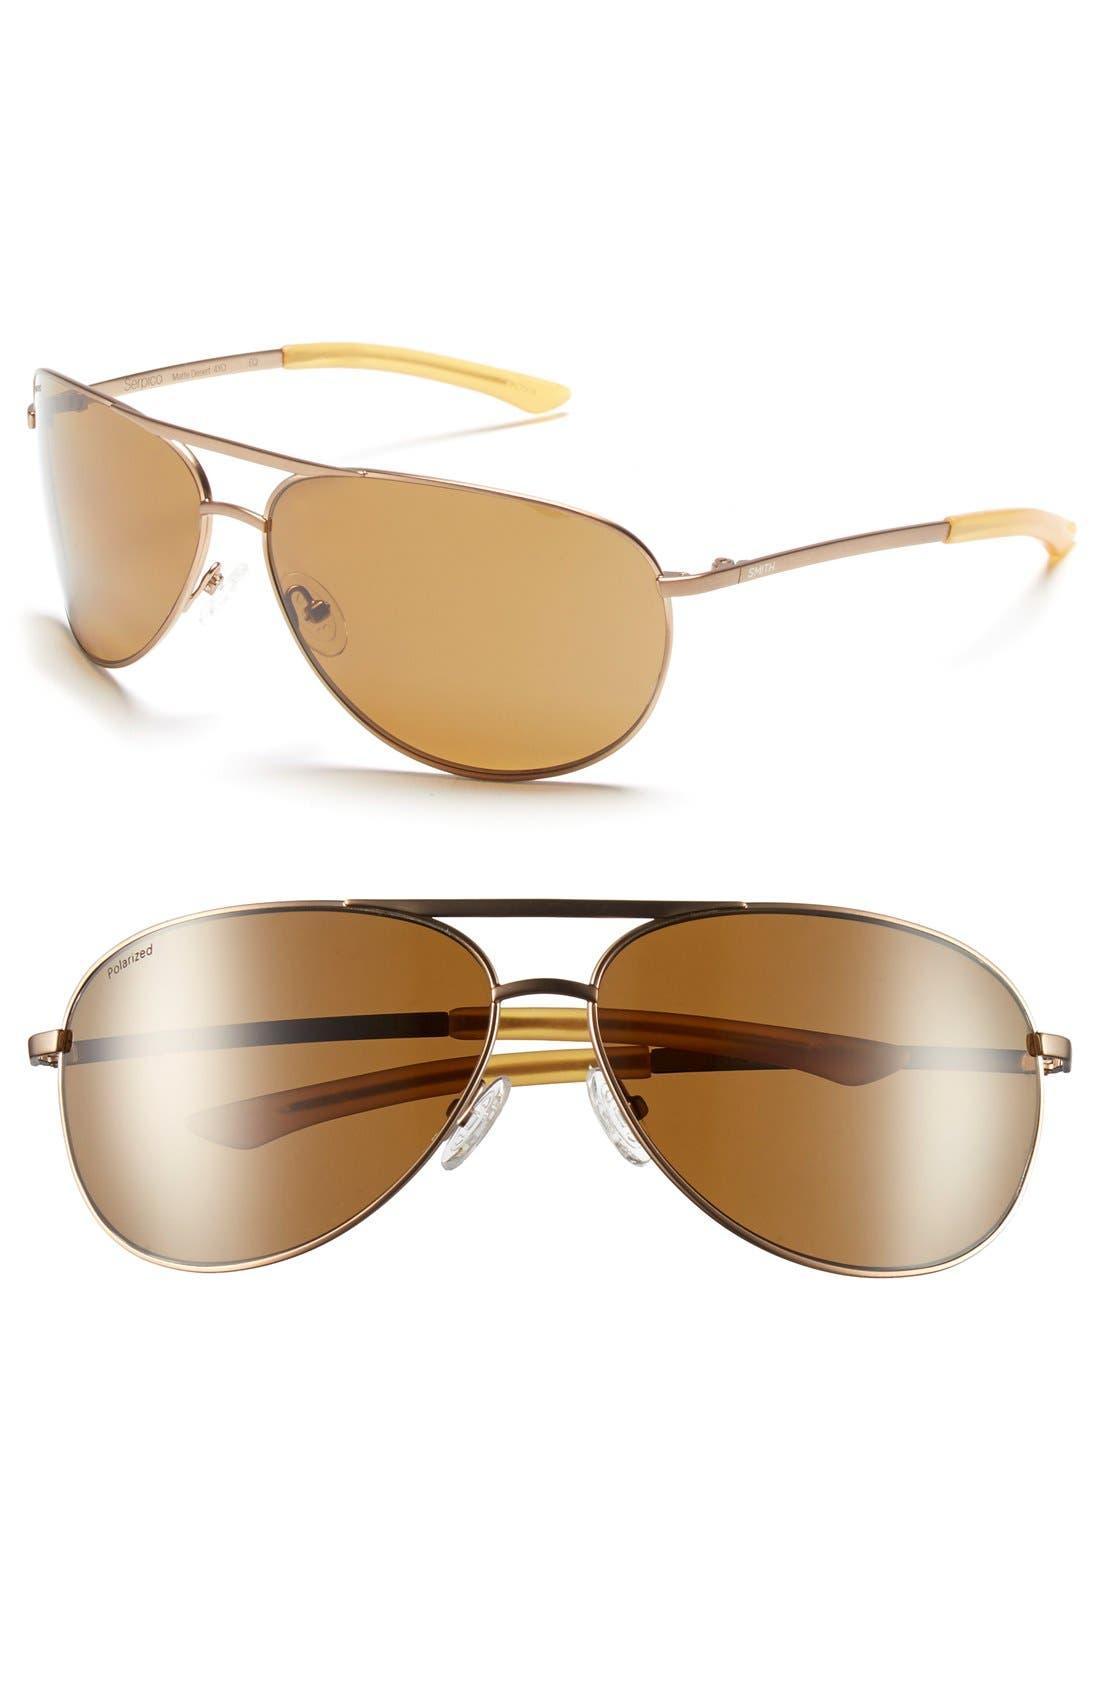 4b1f5f74ca67 Smith Serpico 65Mm Polarized Aviator Sunglasses - Matte Desert  Polar Brown